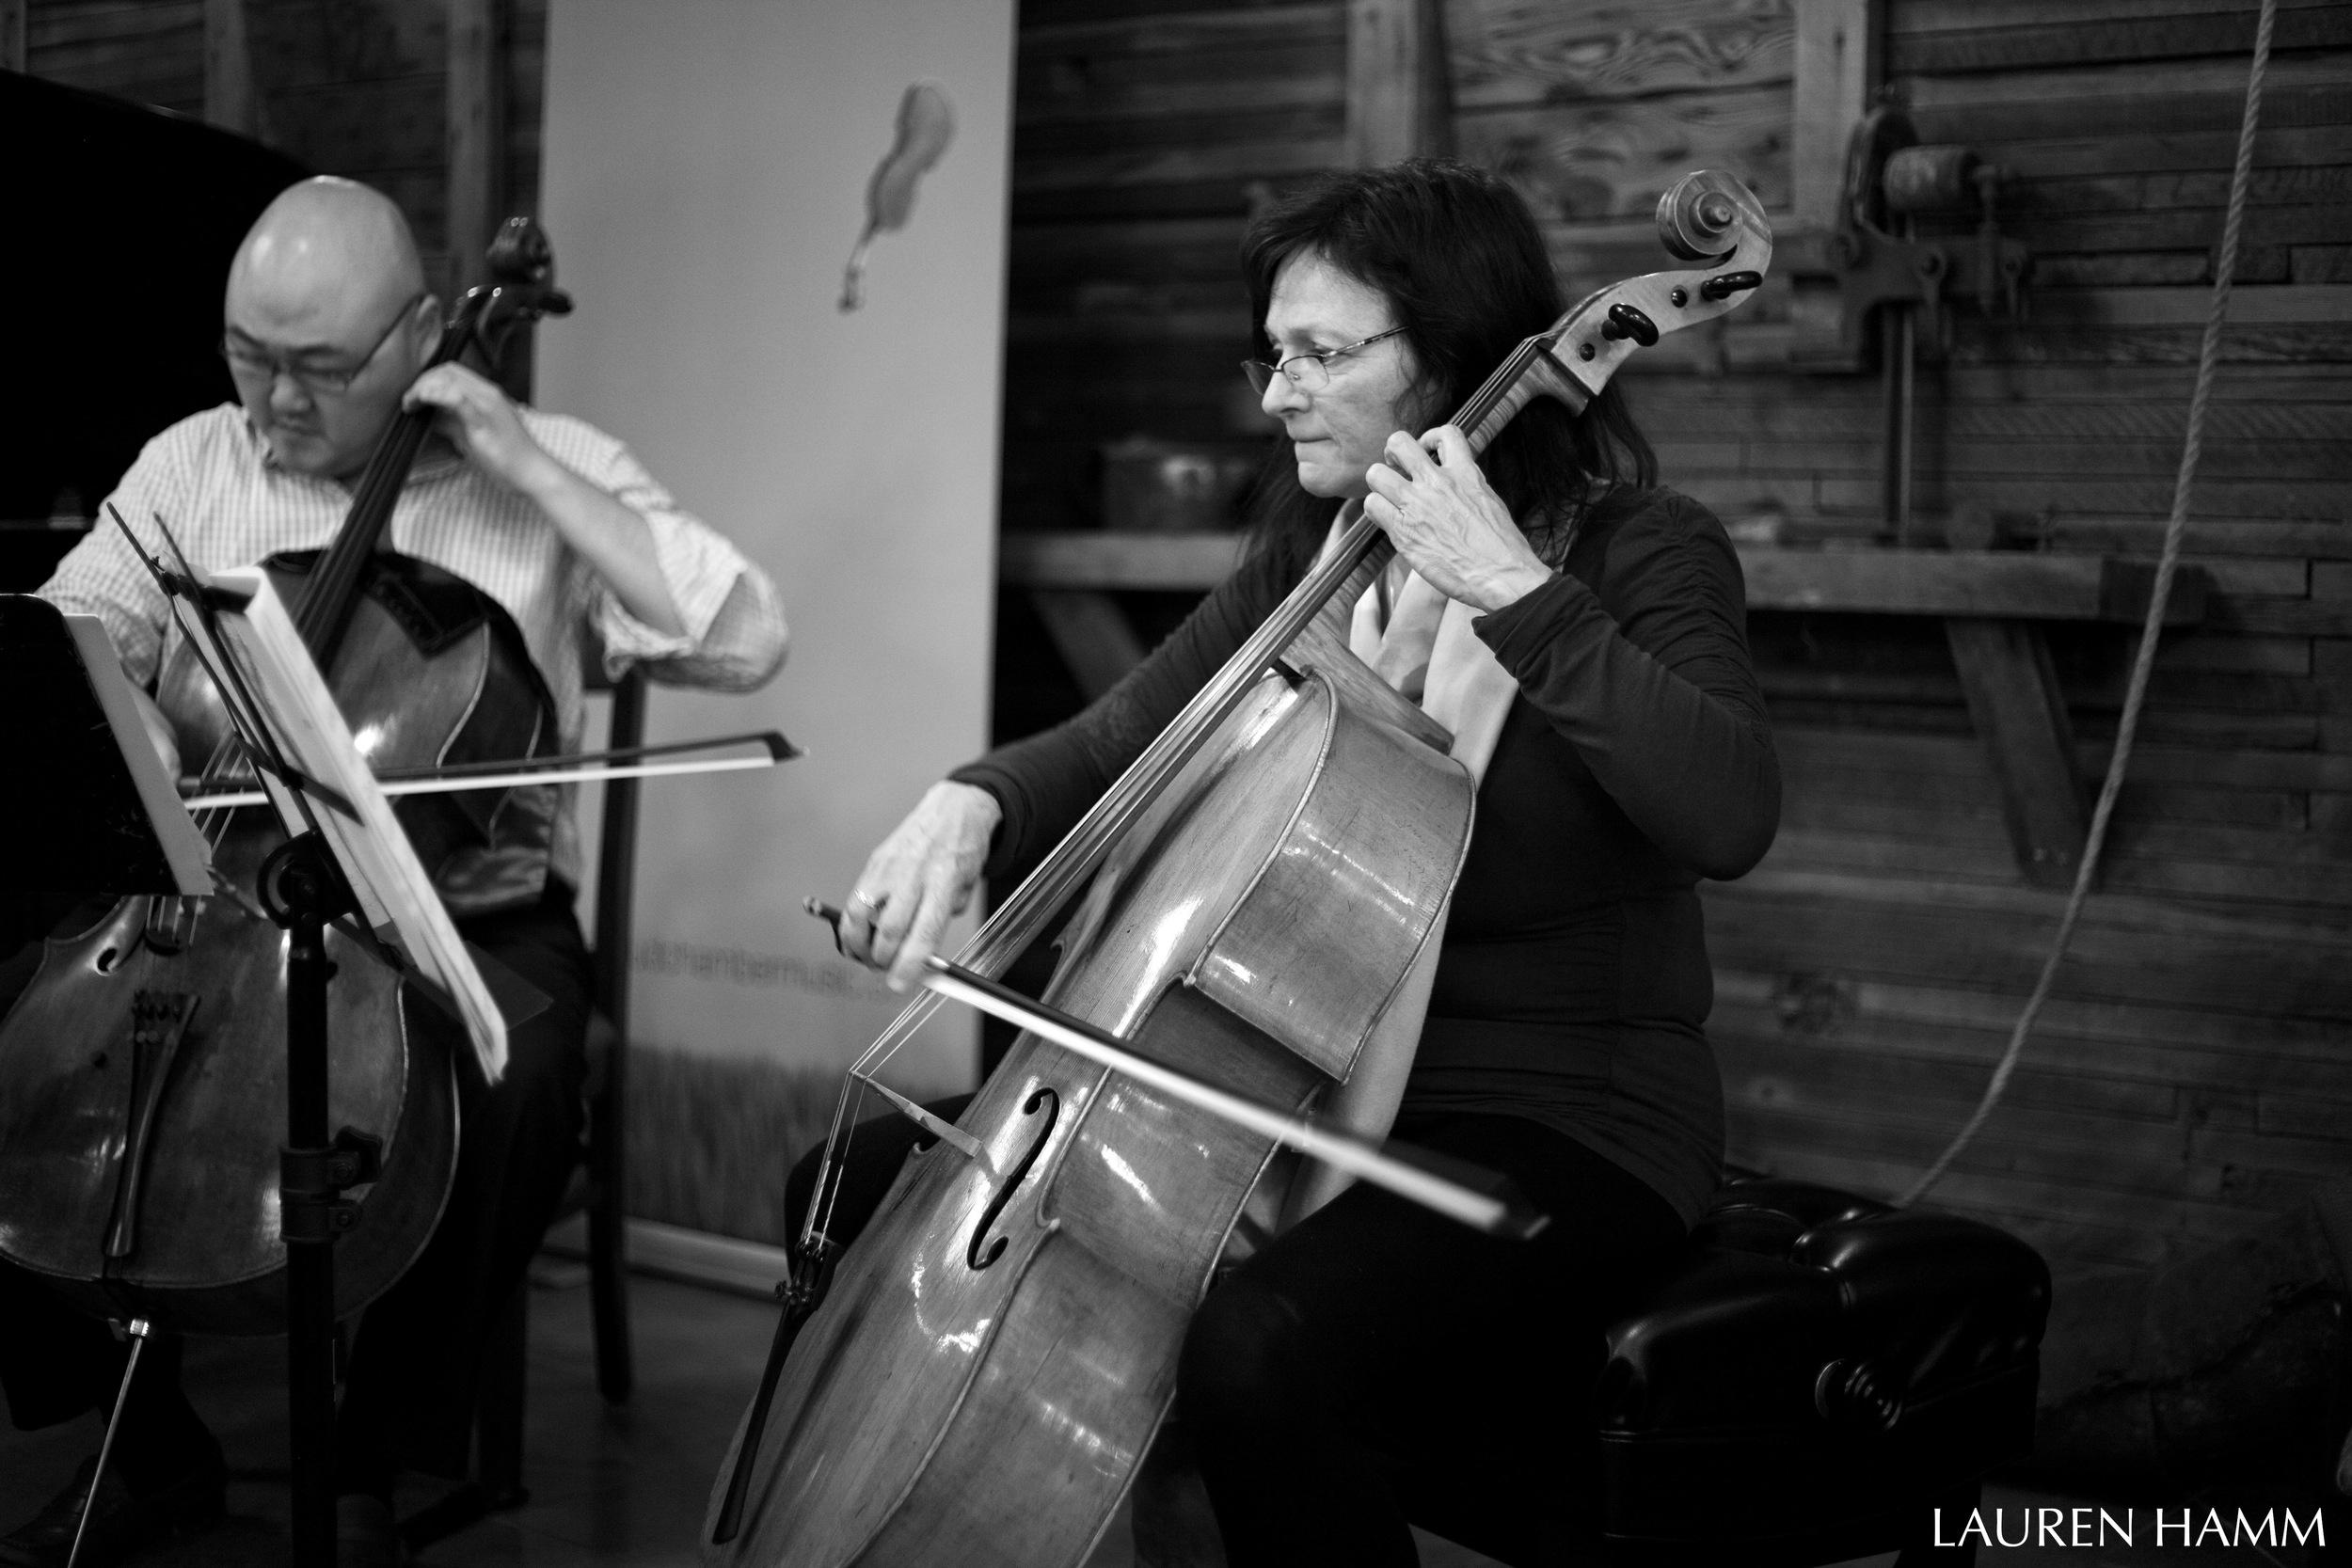 Rosebud Chamber Music Festival | Calgary Photographer | Event Photography | Alberta Photographer | YYC | Lauren Hamm Photography